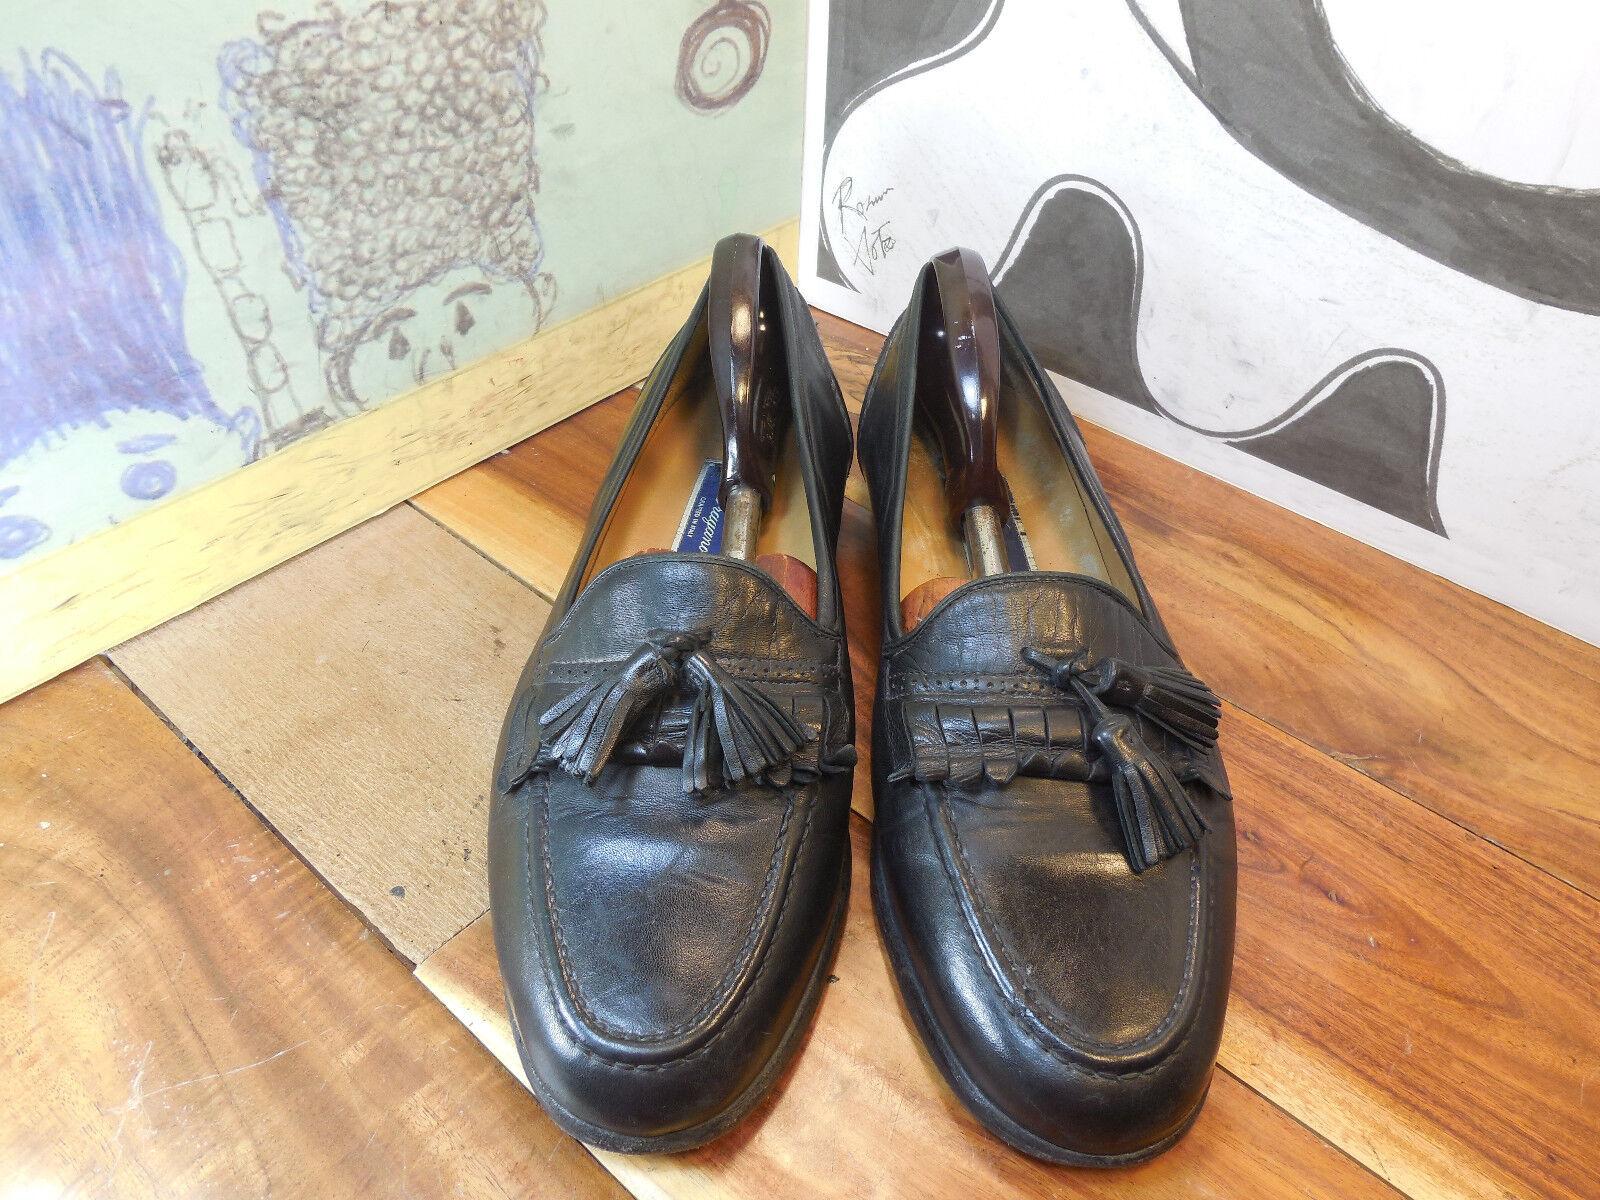 Bragano Black Leather 11.5M Kiltie Tassel Loafers Men's 11.5M Leather #C00895 Made in Italy 2e42b5